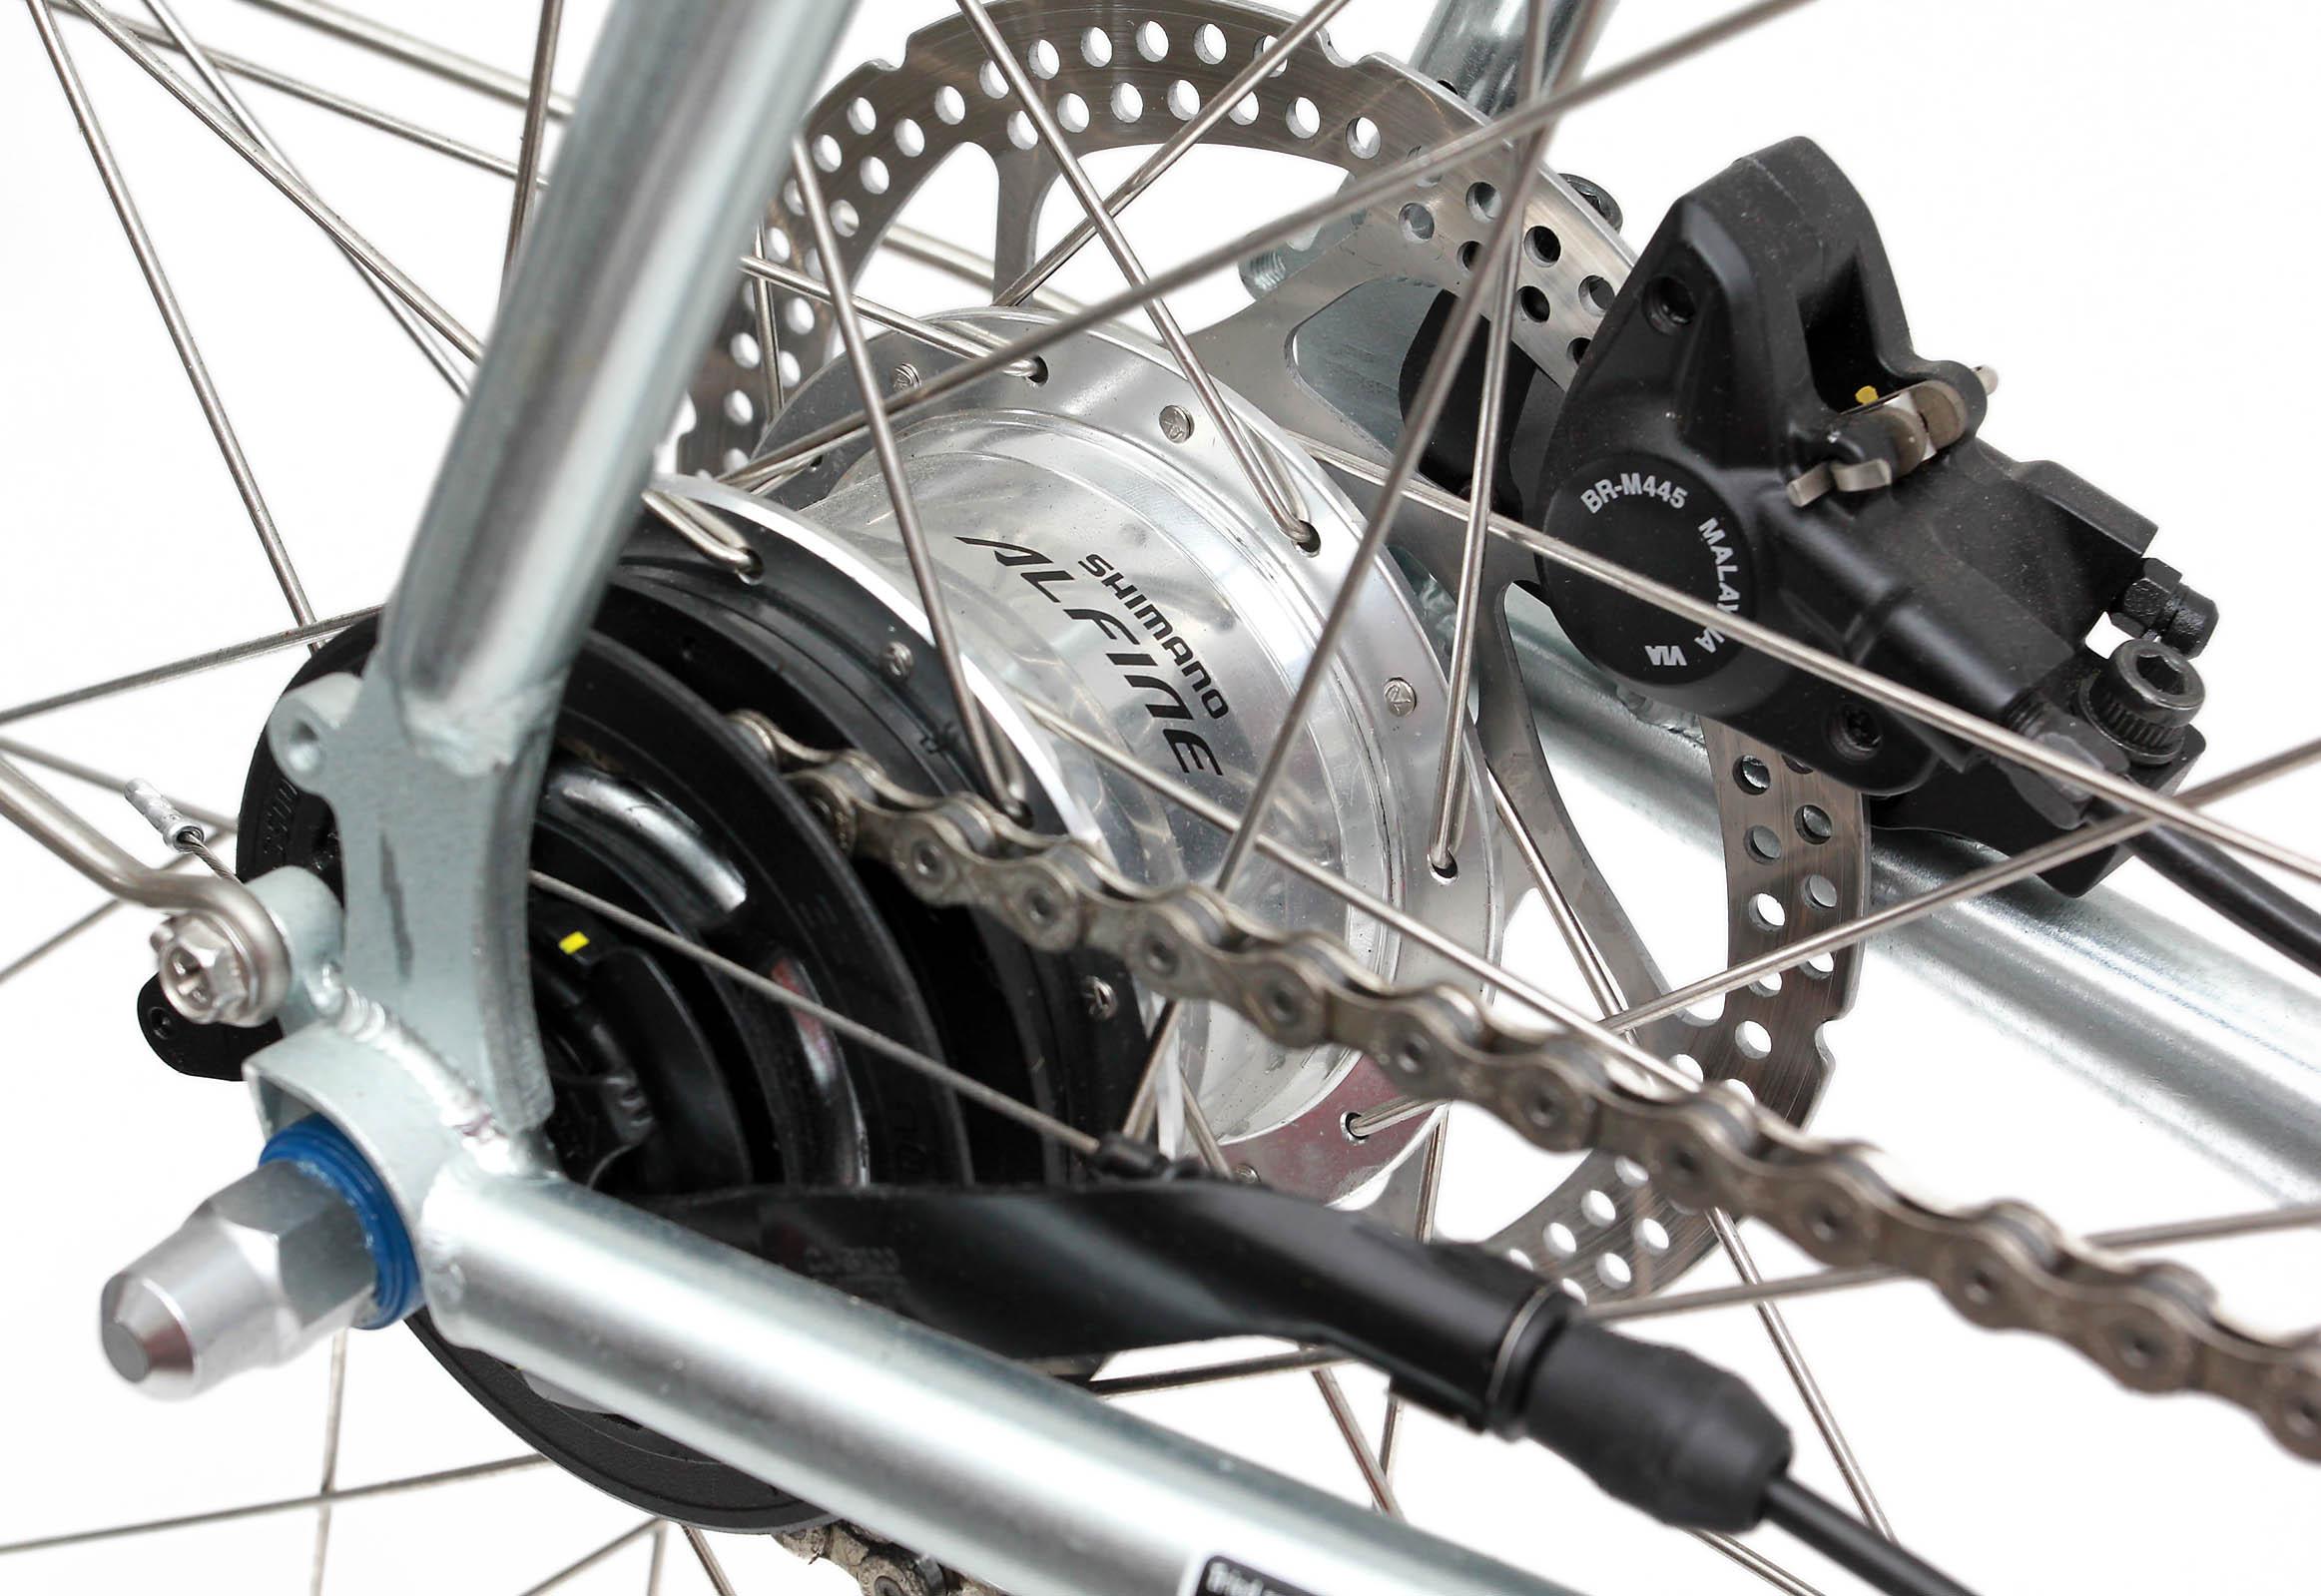 SHIMANO Alfine 11-Speed Internal Geared Bicycle Disc Brake Hub SG-S7001-11